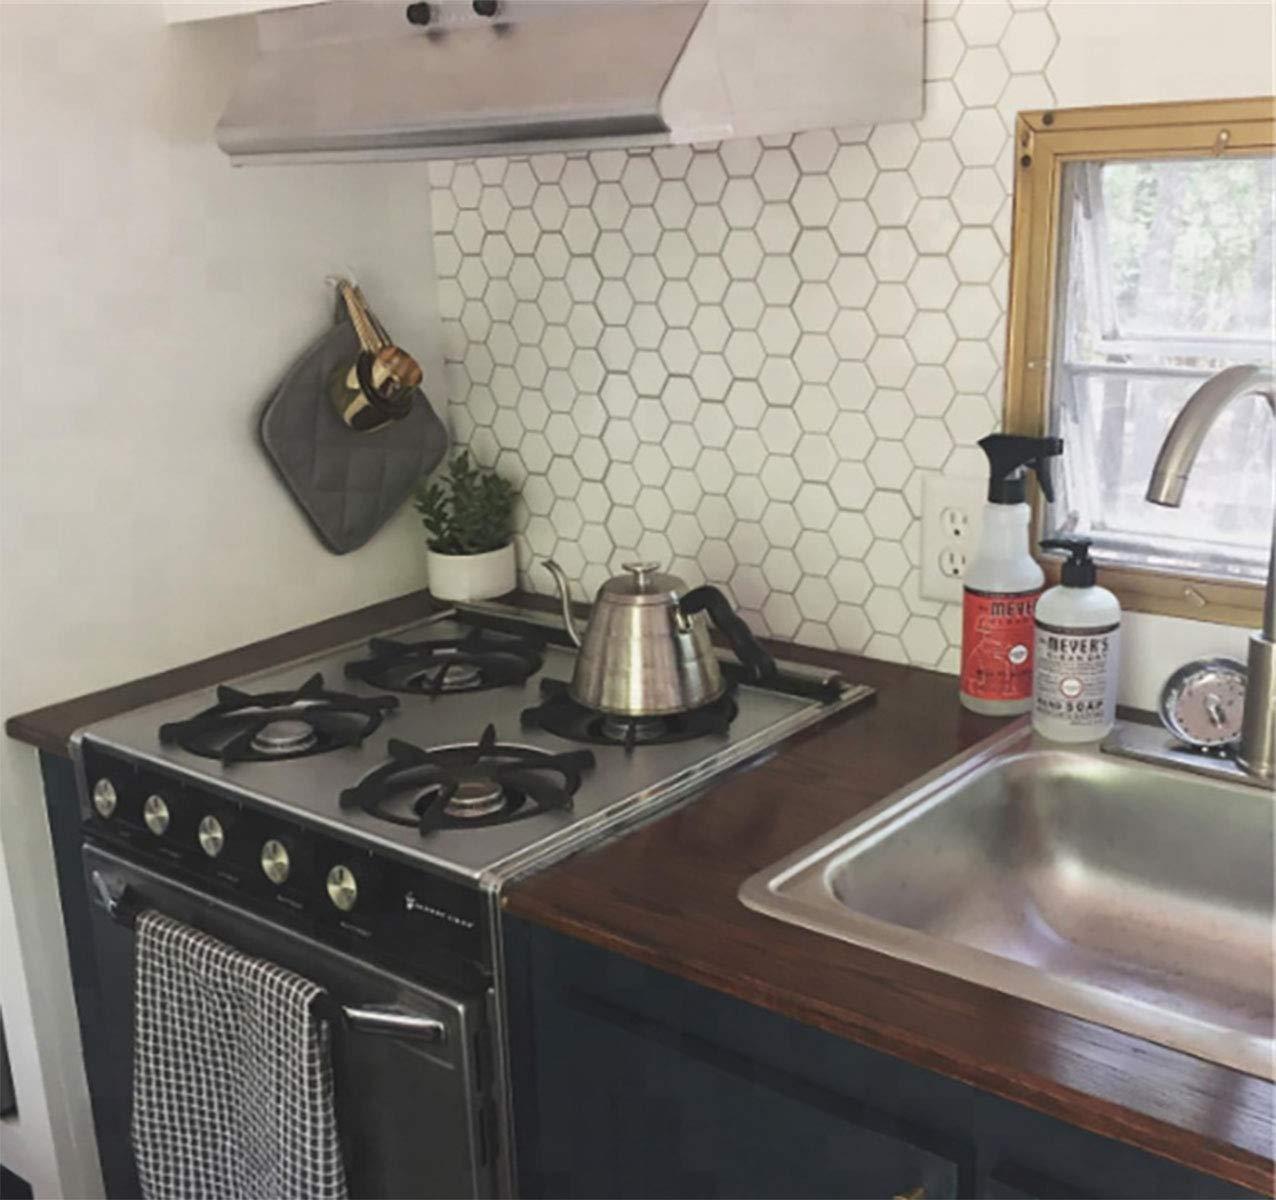 "Carrara Marble Backsplash,HONJAN Renters Groutless Removable Adhesive White Hexagon Vinyl Backsplash for Kitchen Bathroom 10""x10"" Pack of 13 (A) by HONJAN (Image #6)"